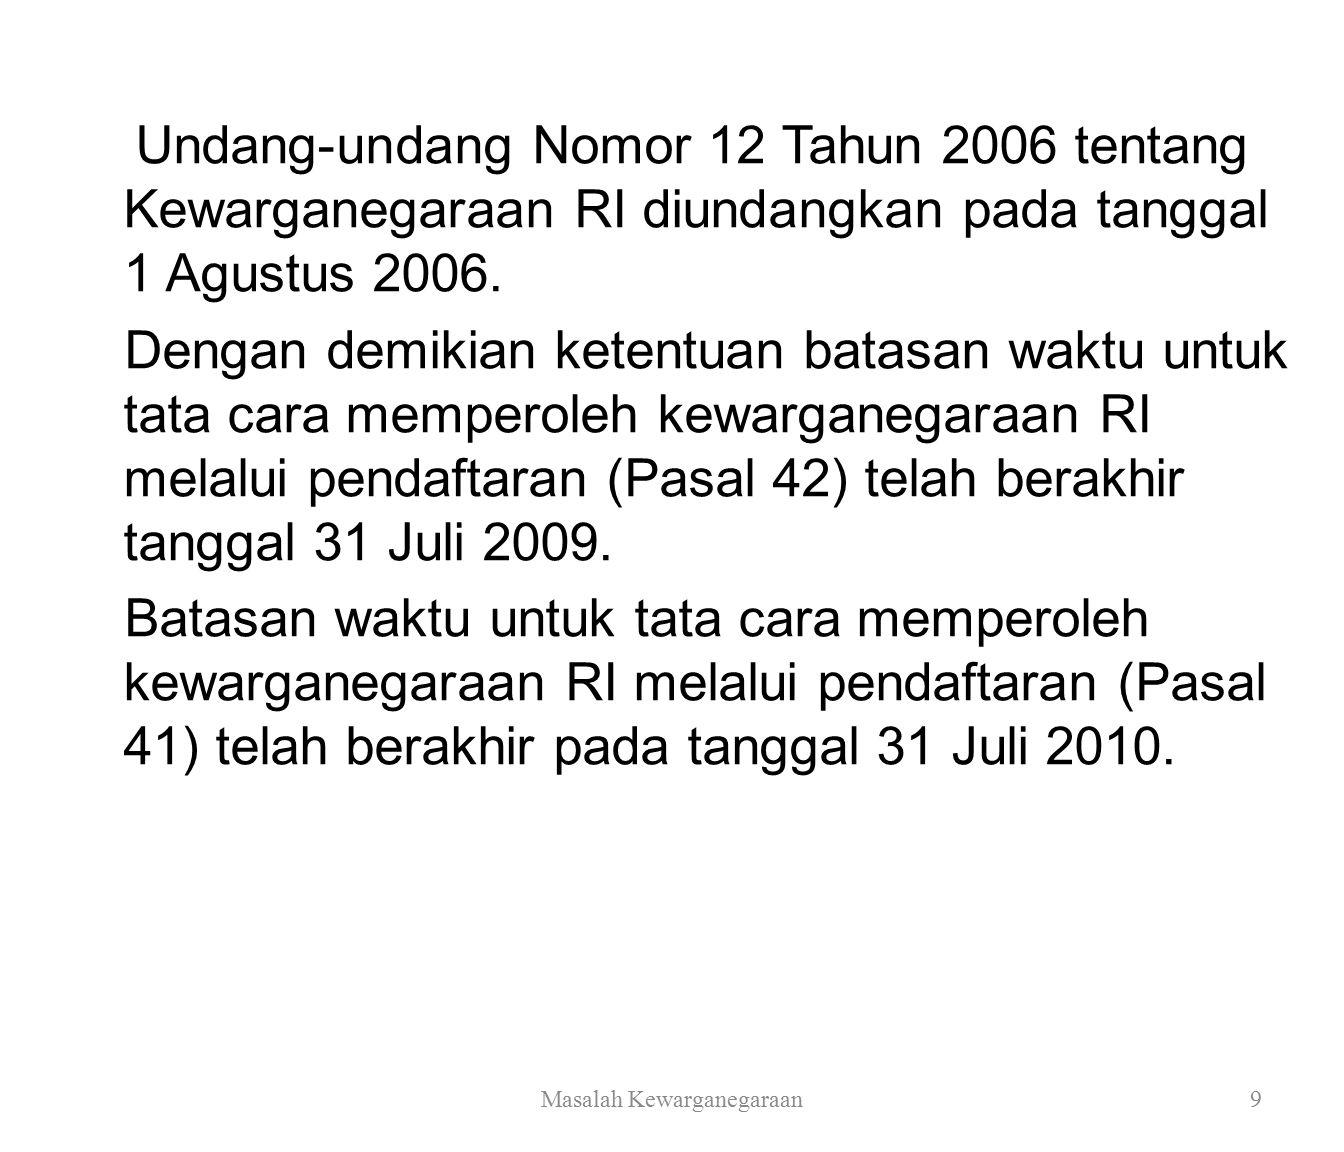 Undang-undang Nomor 12 Tahun 2006 tentang Kewarganegaraan RI diundangkan pada tanggal 1 Agustus 2006.